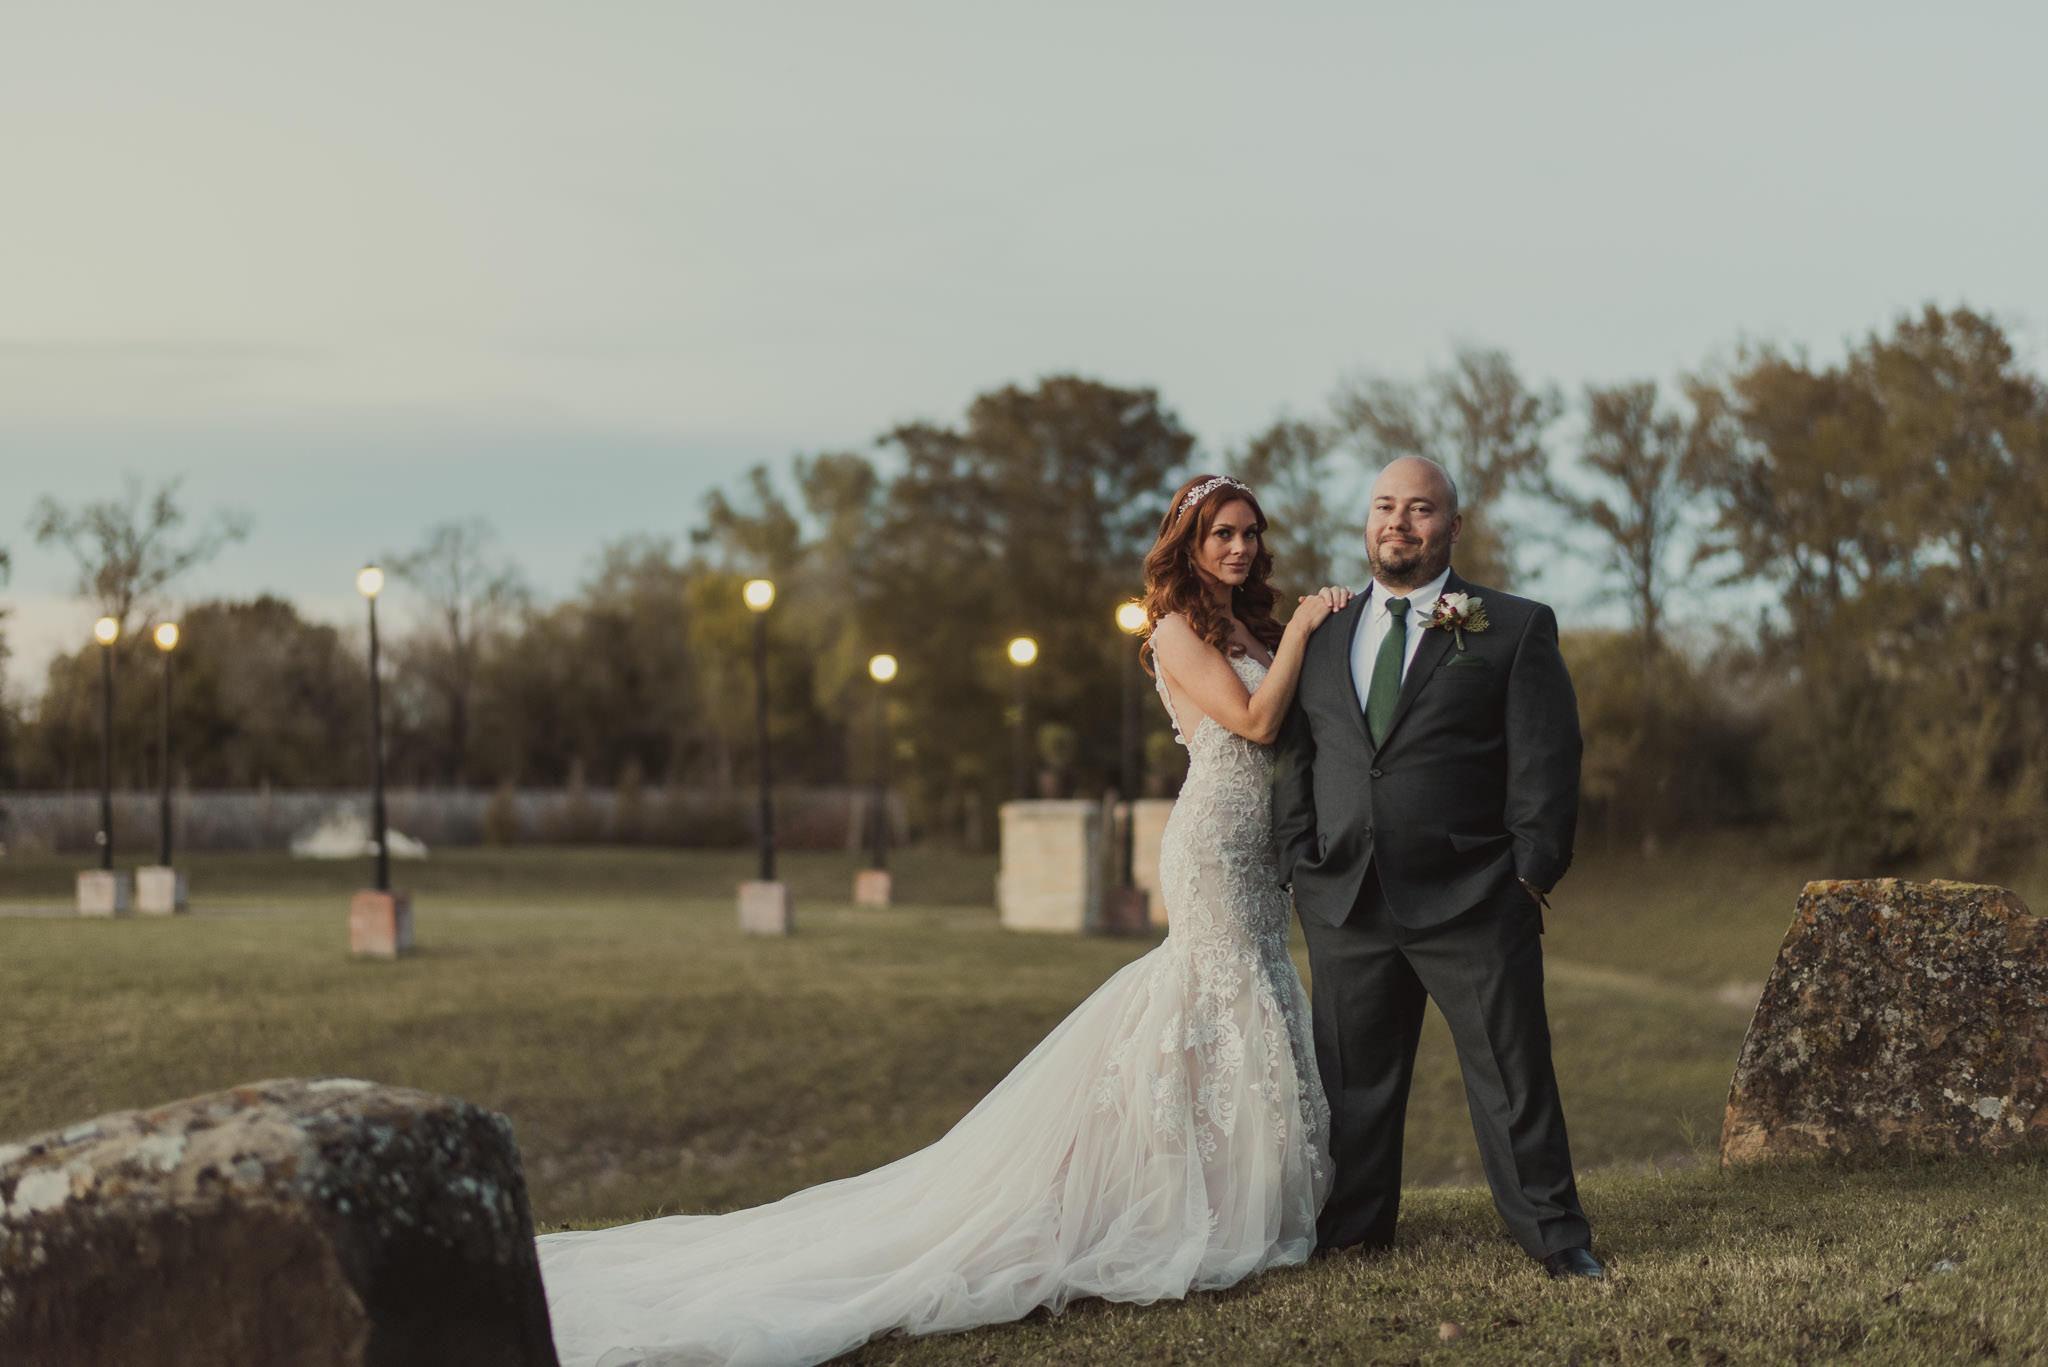 Cynthia-Curtis-Olde-Dobbine-Station-Houston-Wedding-Photographer-sm-85.jpg